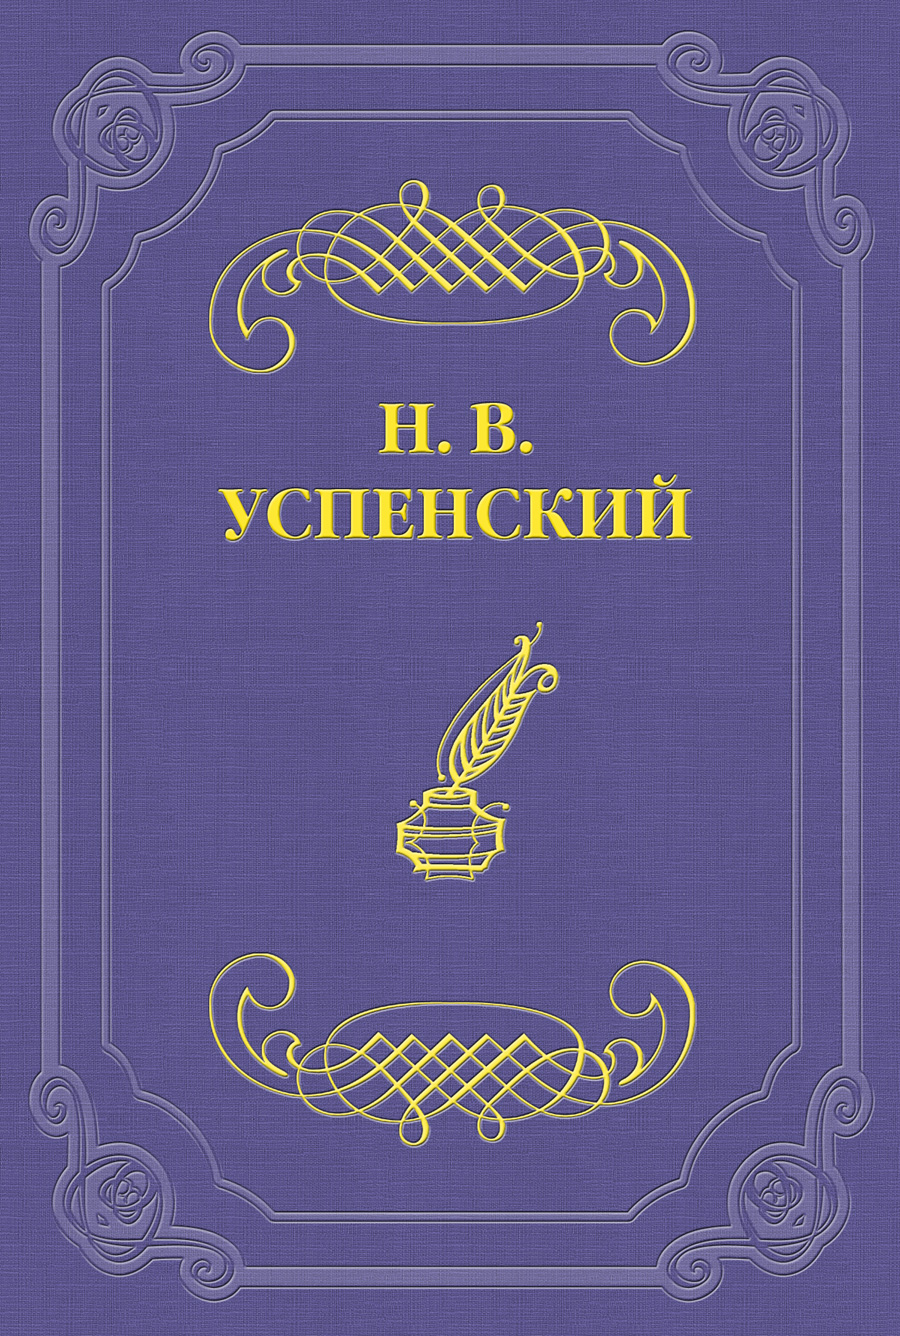 Николай Васильевич Успенский А. И. Левитов цена 2017